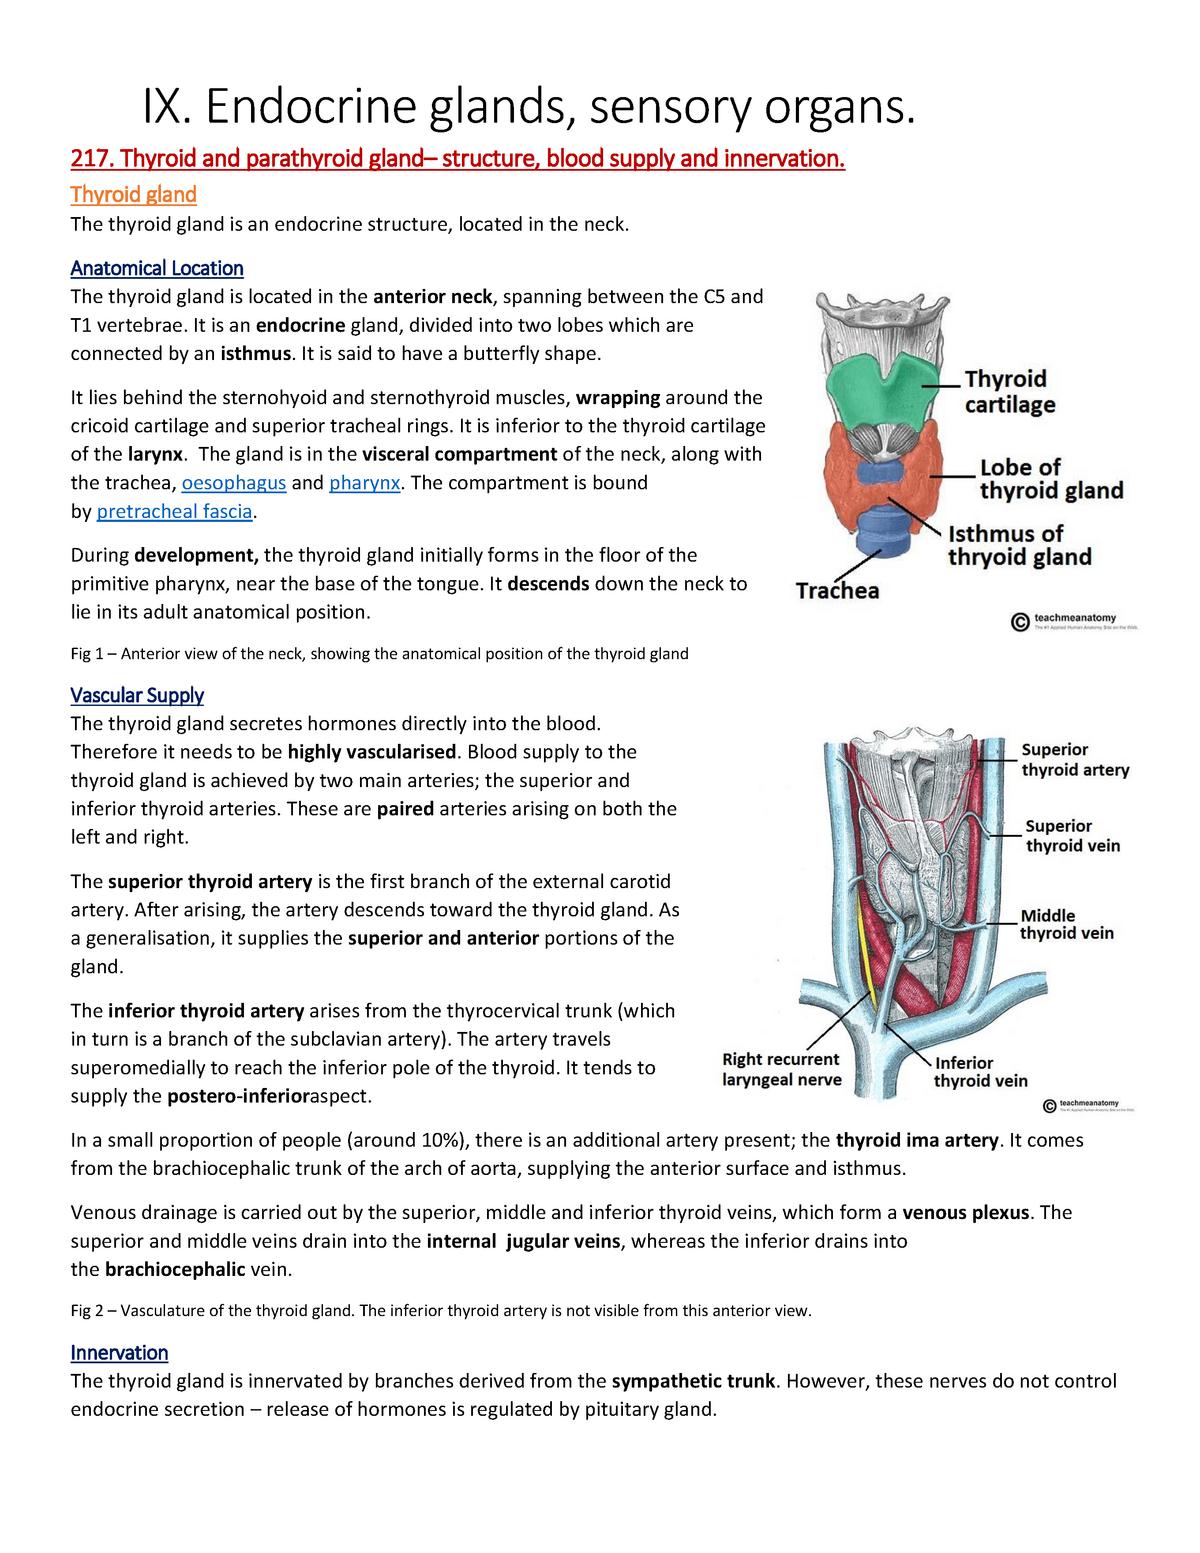 Ix Endocrine Glands Sensory Organs Done Anatomy Studocu